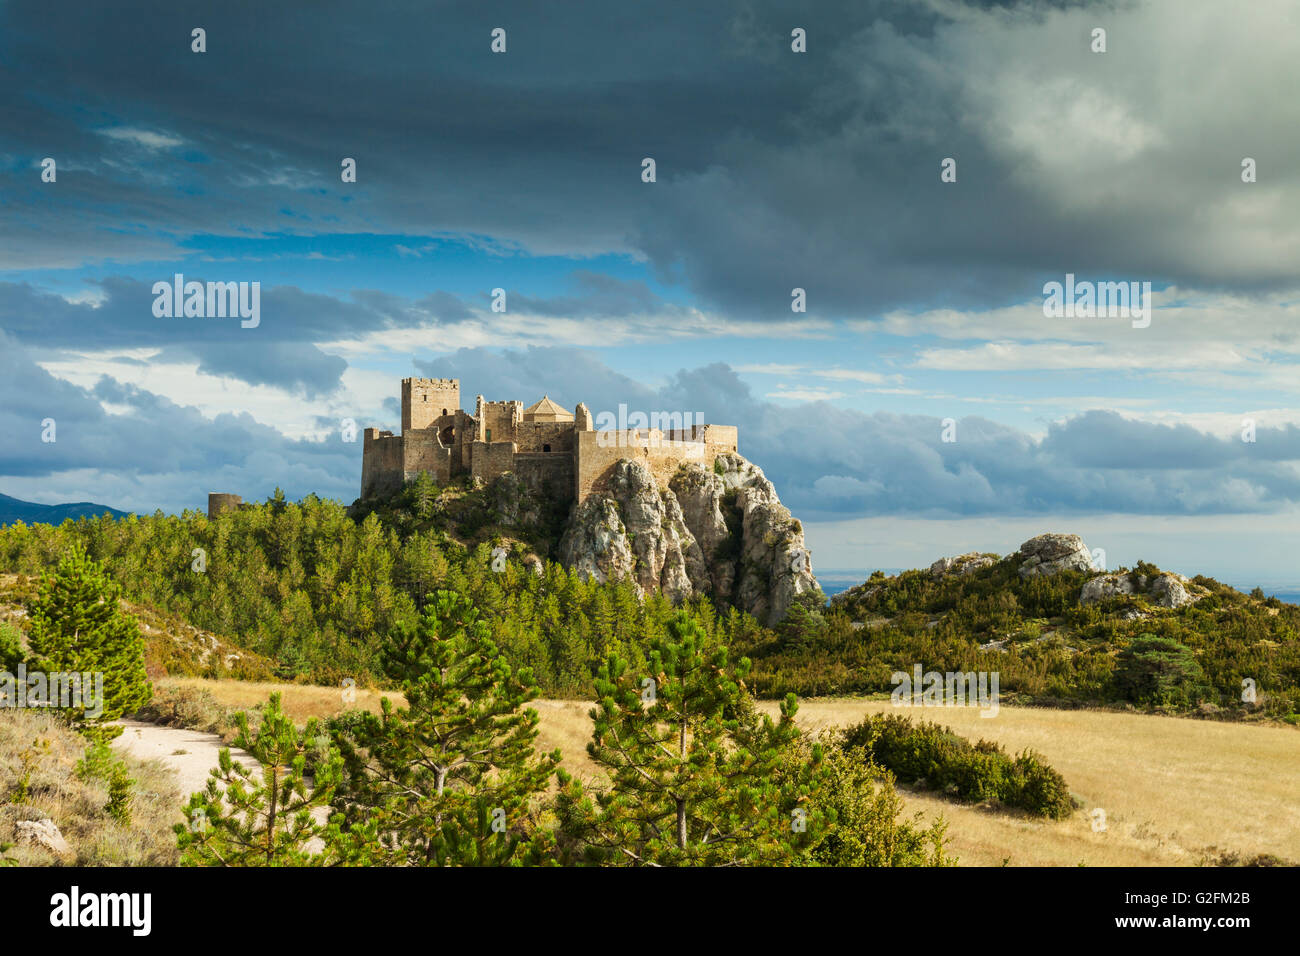 Loarre Castle, Huesca, Spain. Pre-Pyrenees of Aragón. Stock Photo